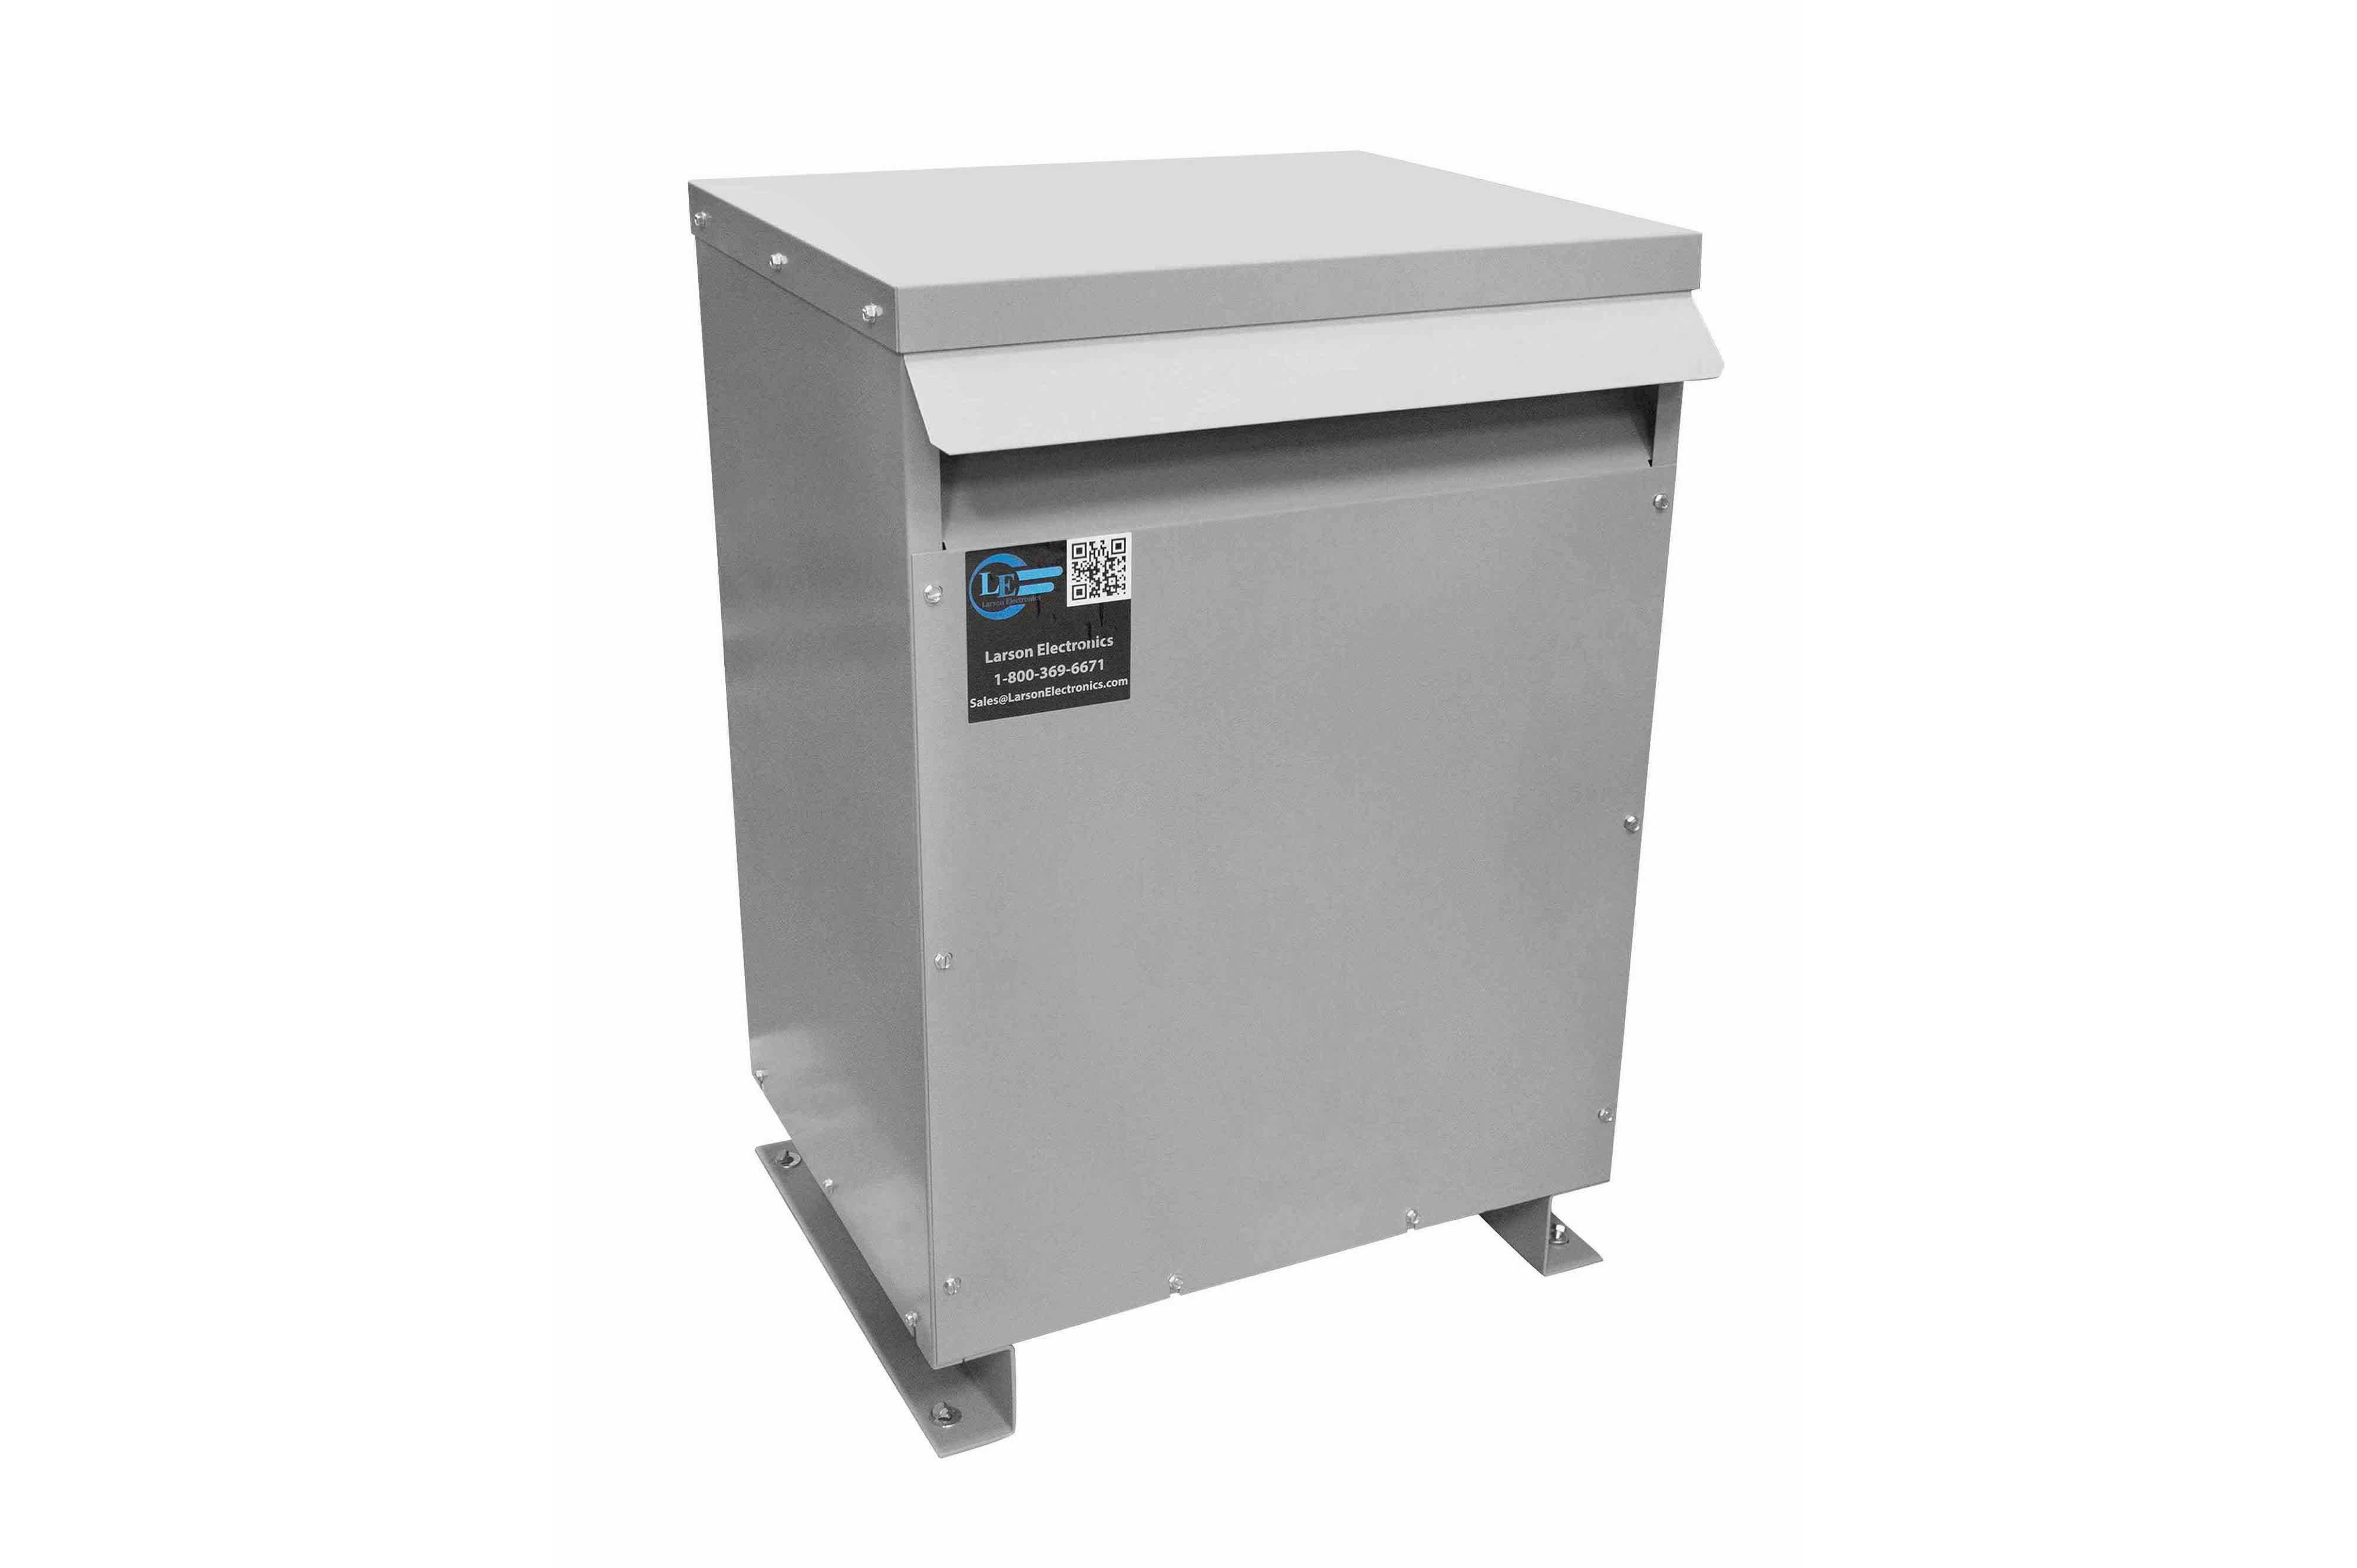 14 kVA 3PH Isolation Transformer, 575V Wye Primary, 400V Delta Secondary, N3R, Ventilated, 60 Hz